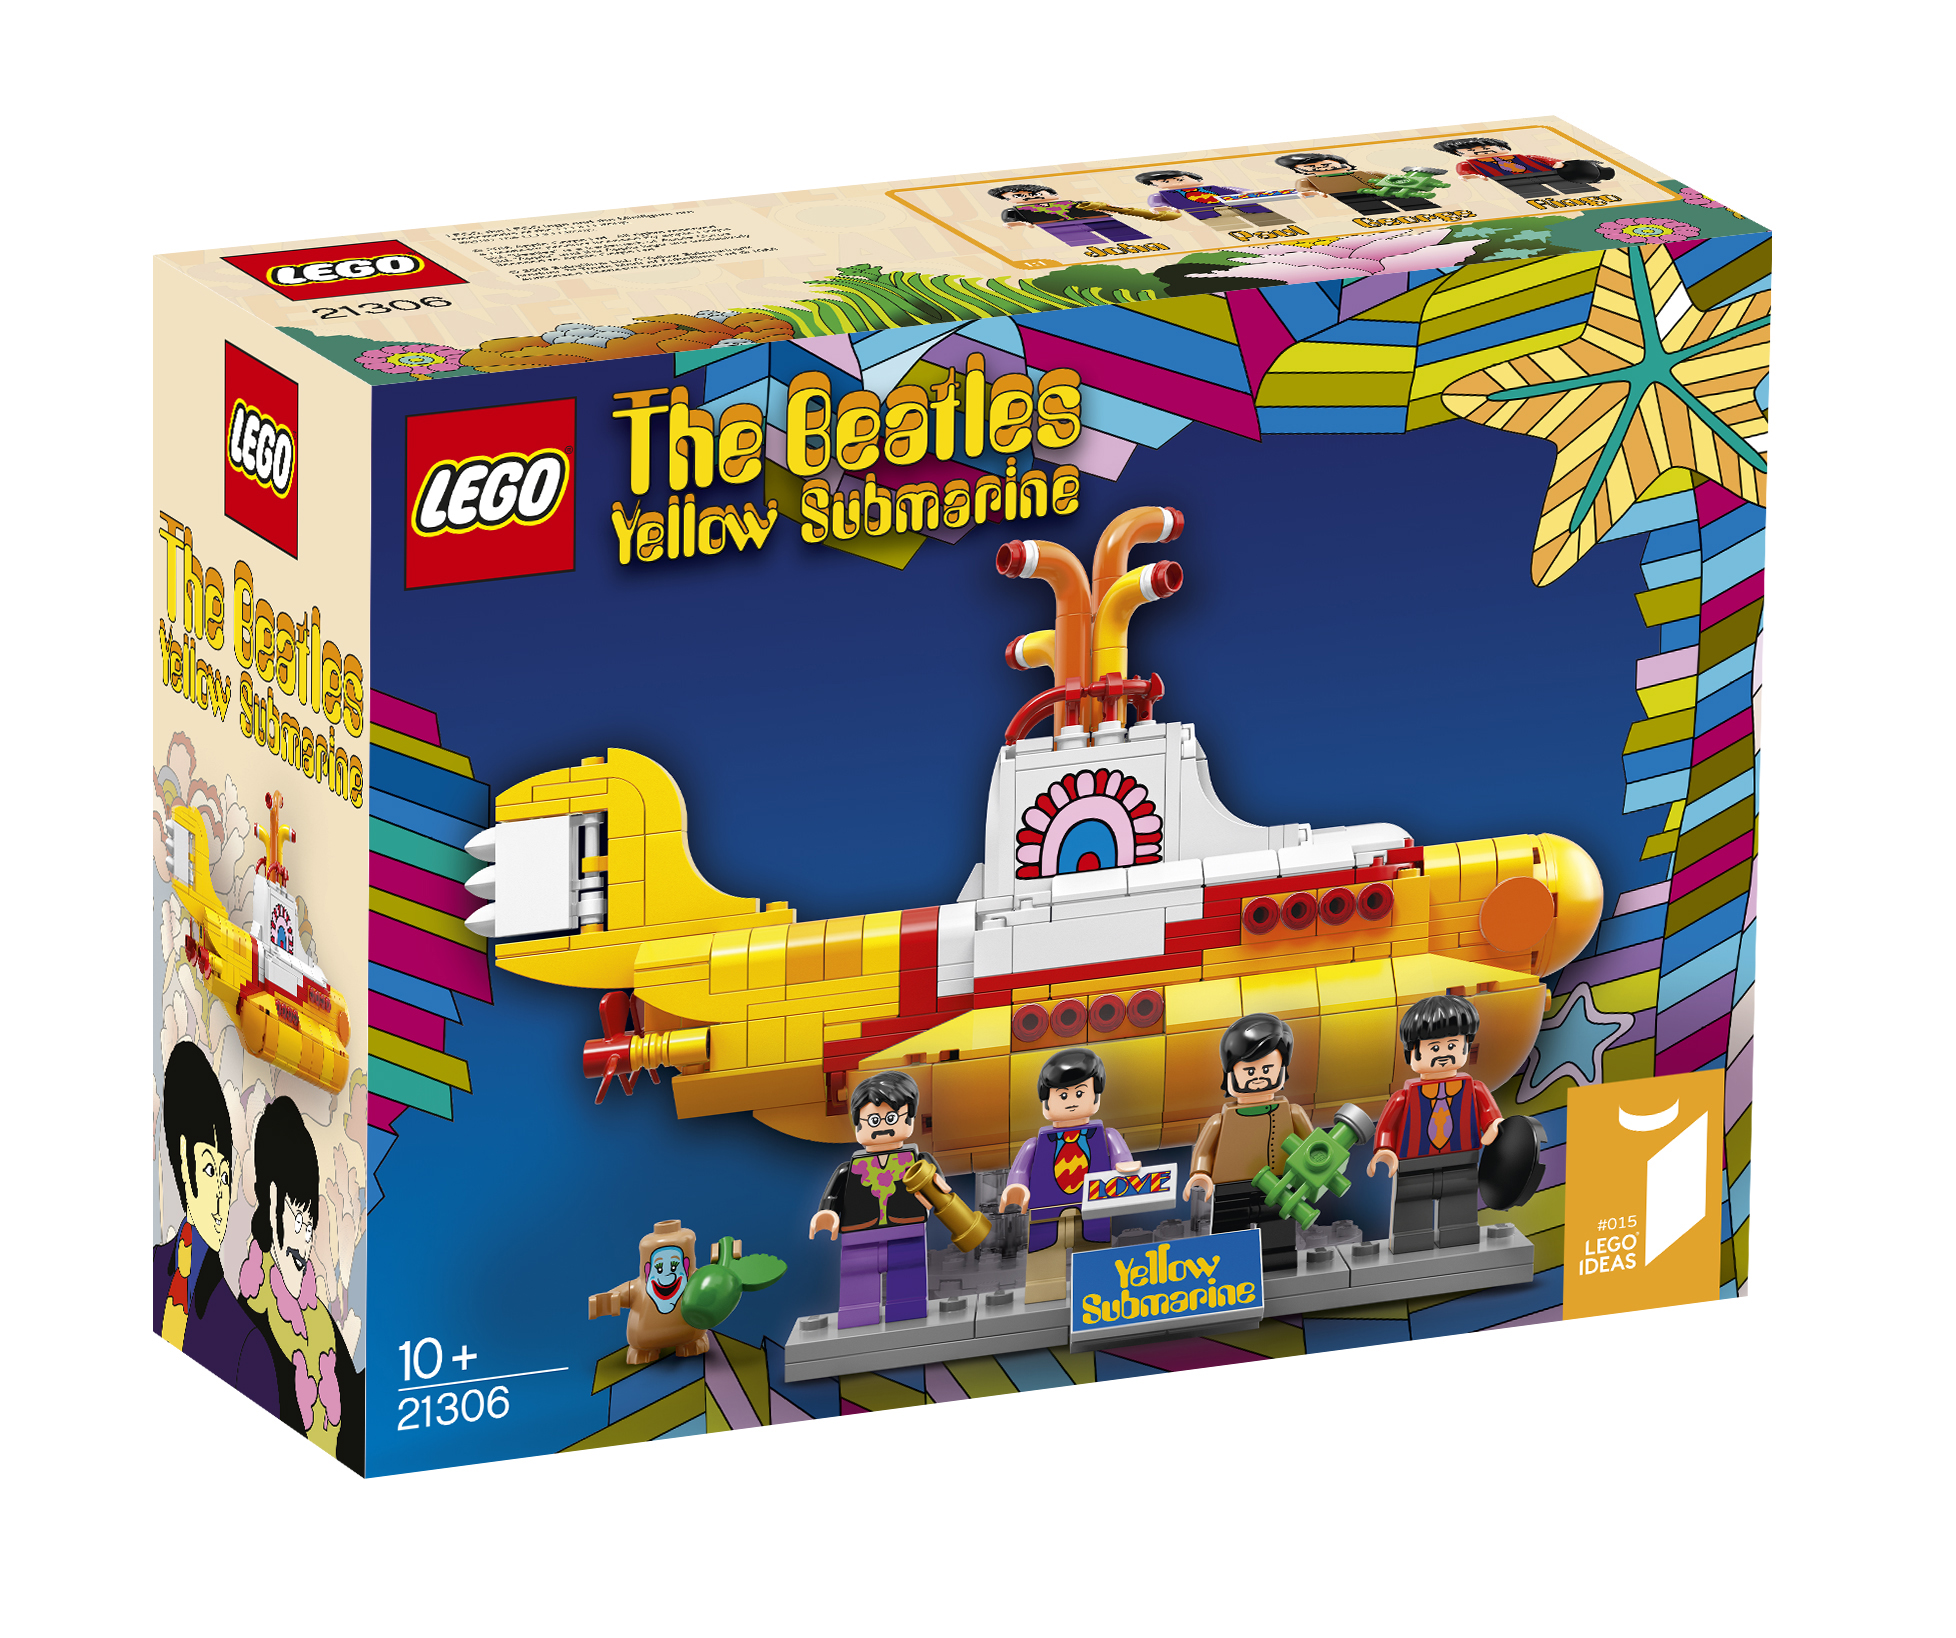 lego-beatles-yellow-submarine-2